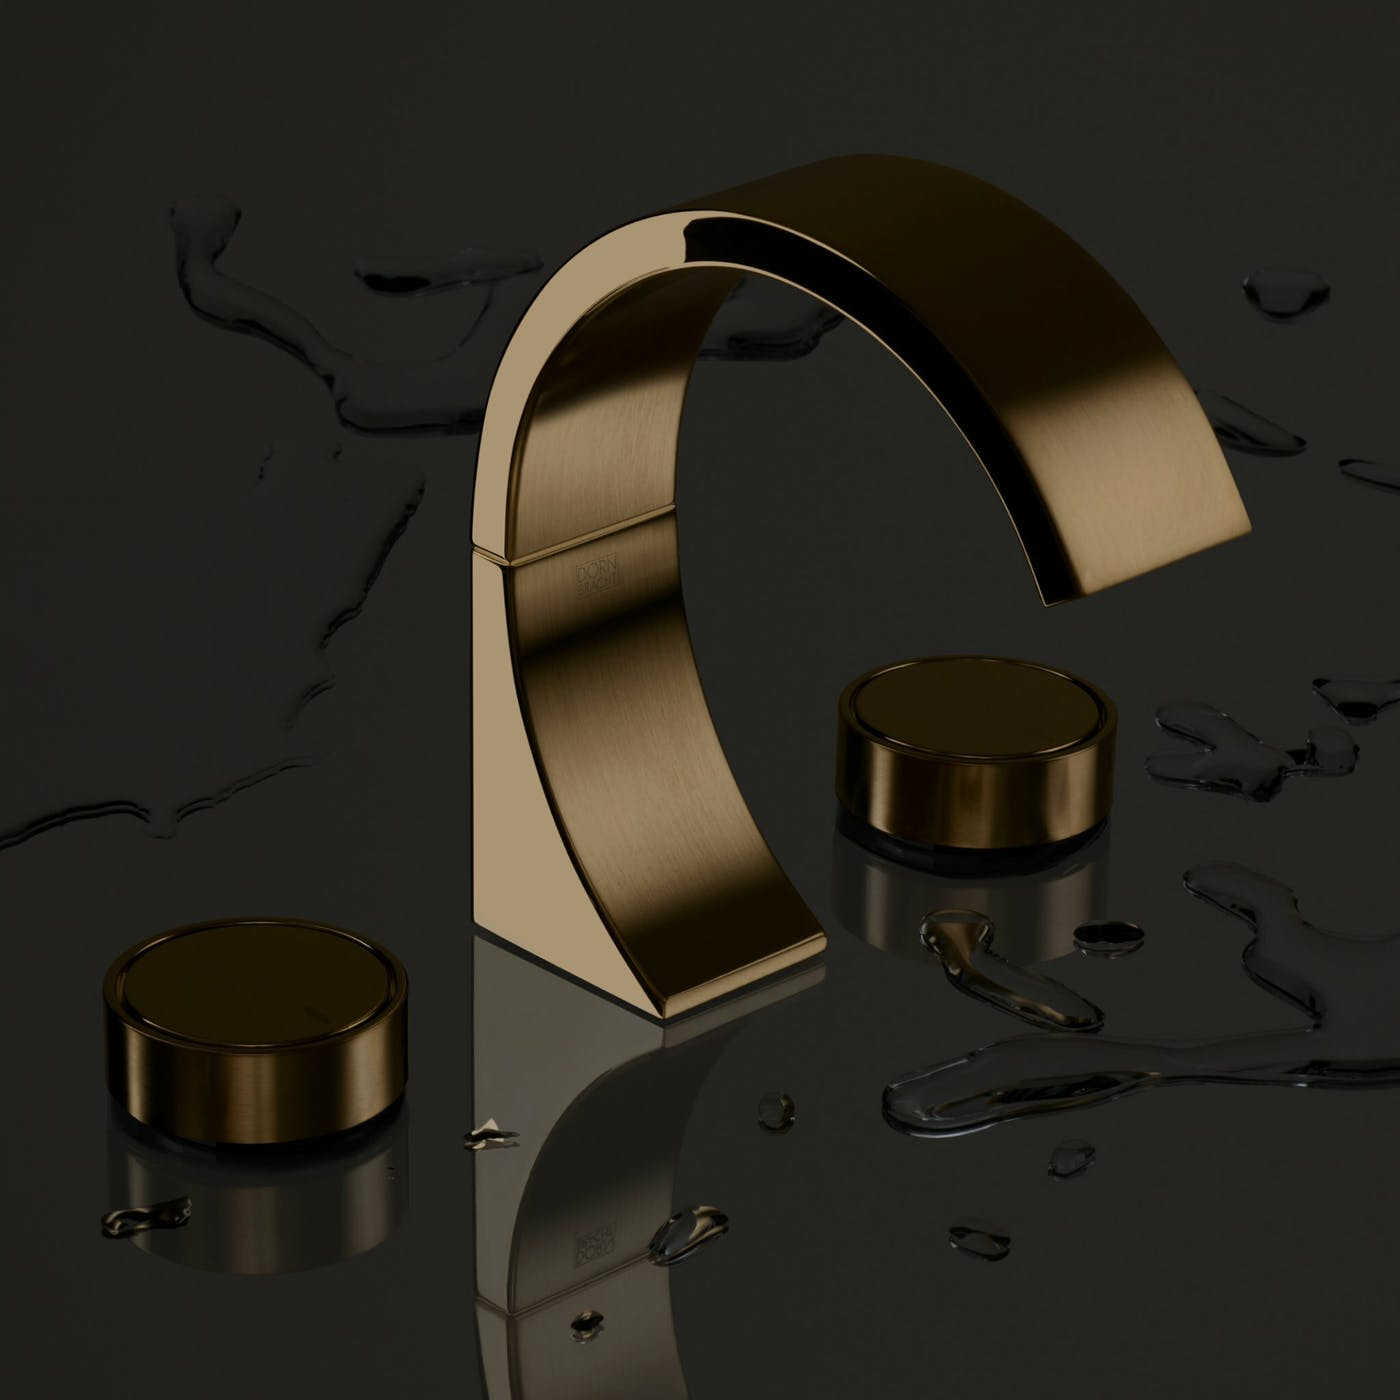 CYO dark and gold